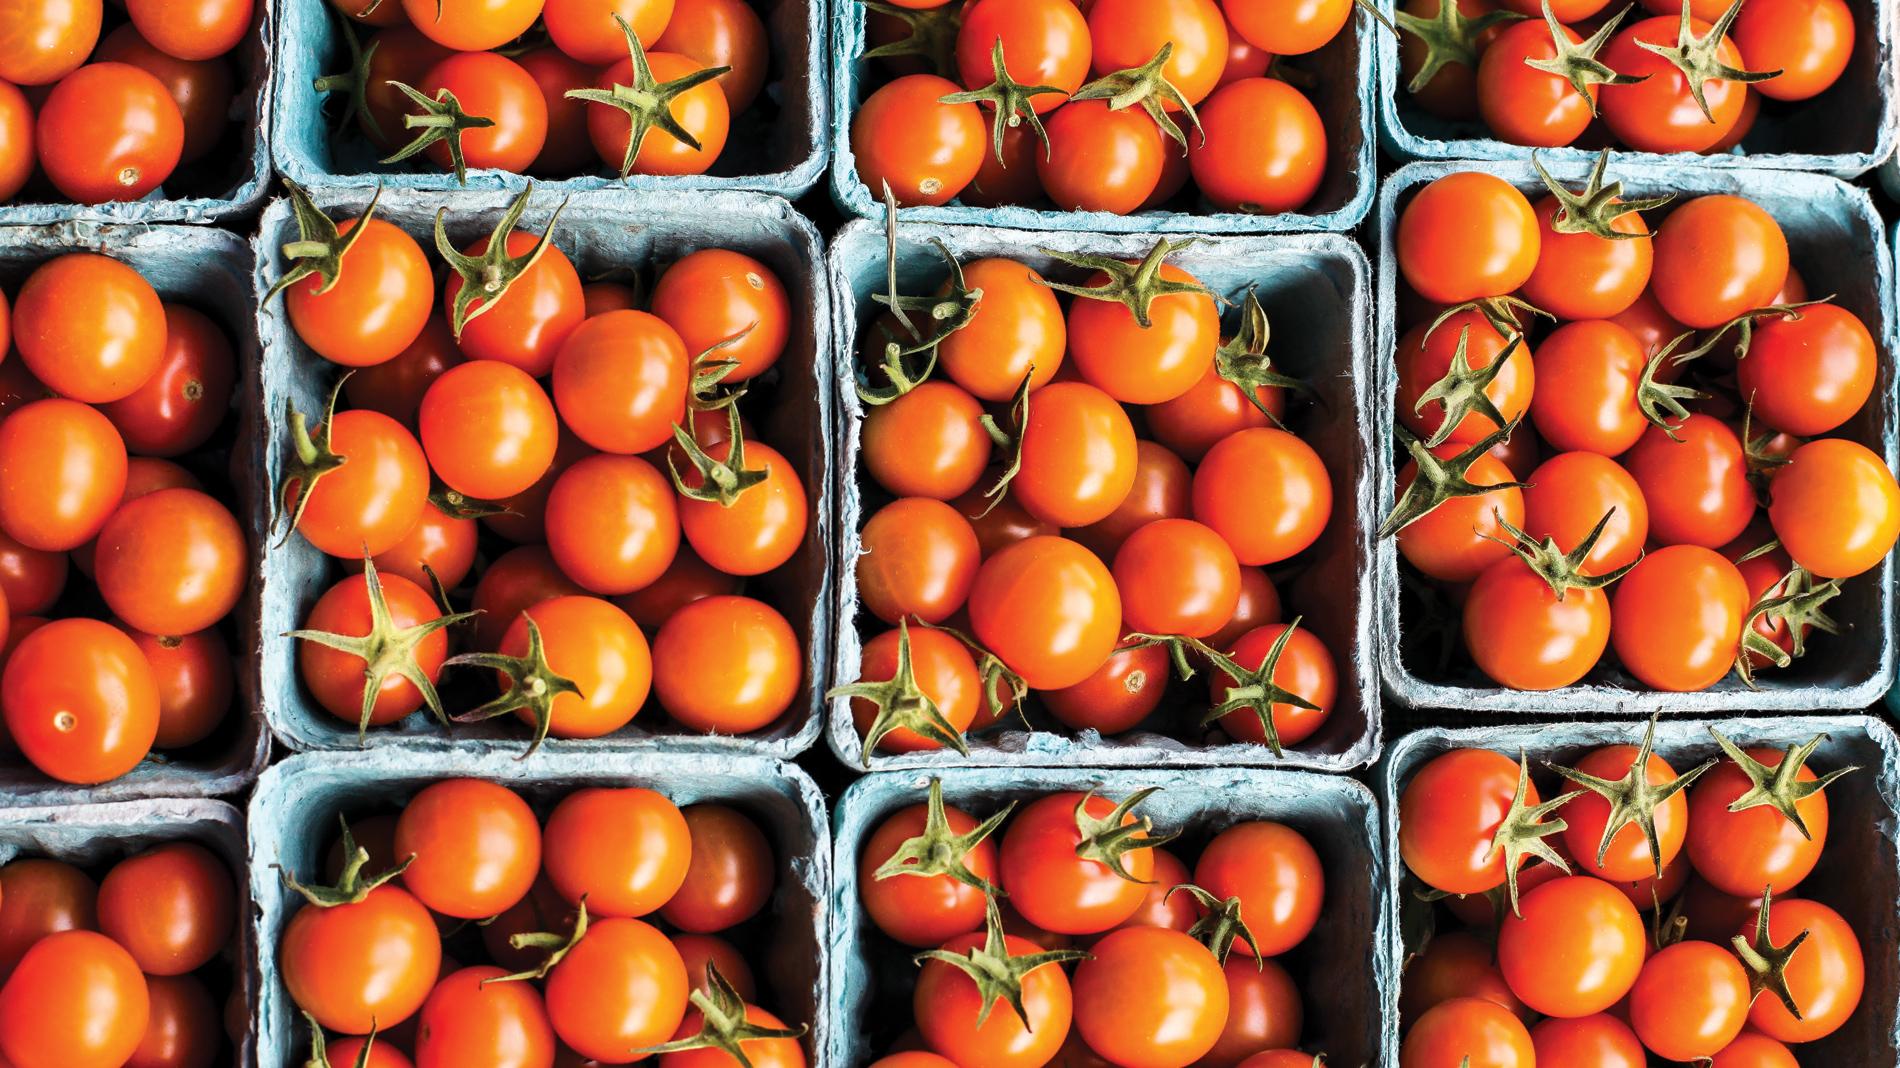 Tomatoes will be in season soon in St. Louis.